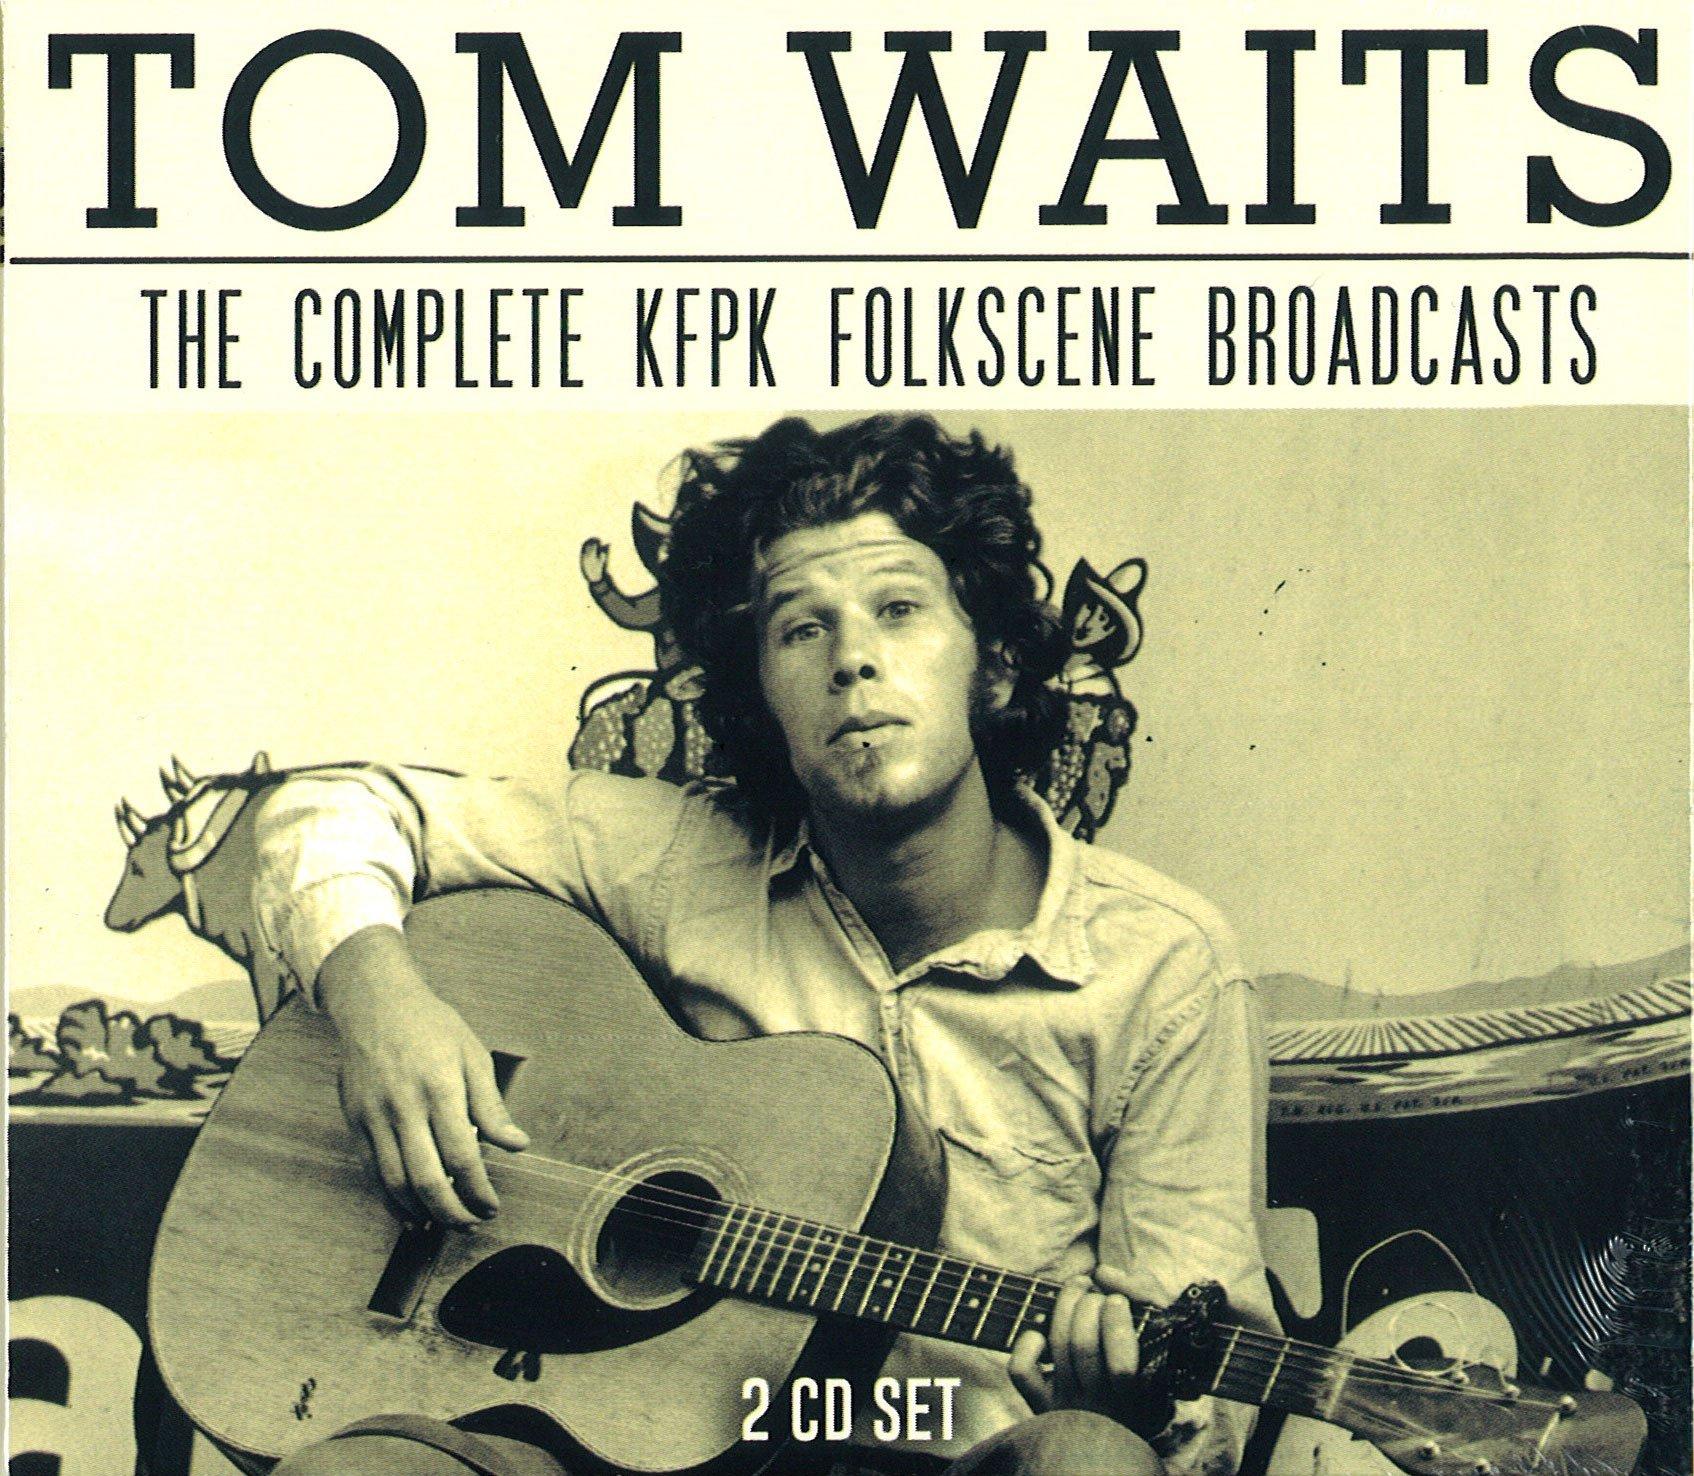 Tom Waits - The Complete KFPK Folkscene Broadcasts (2CD BOX SET)